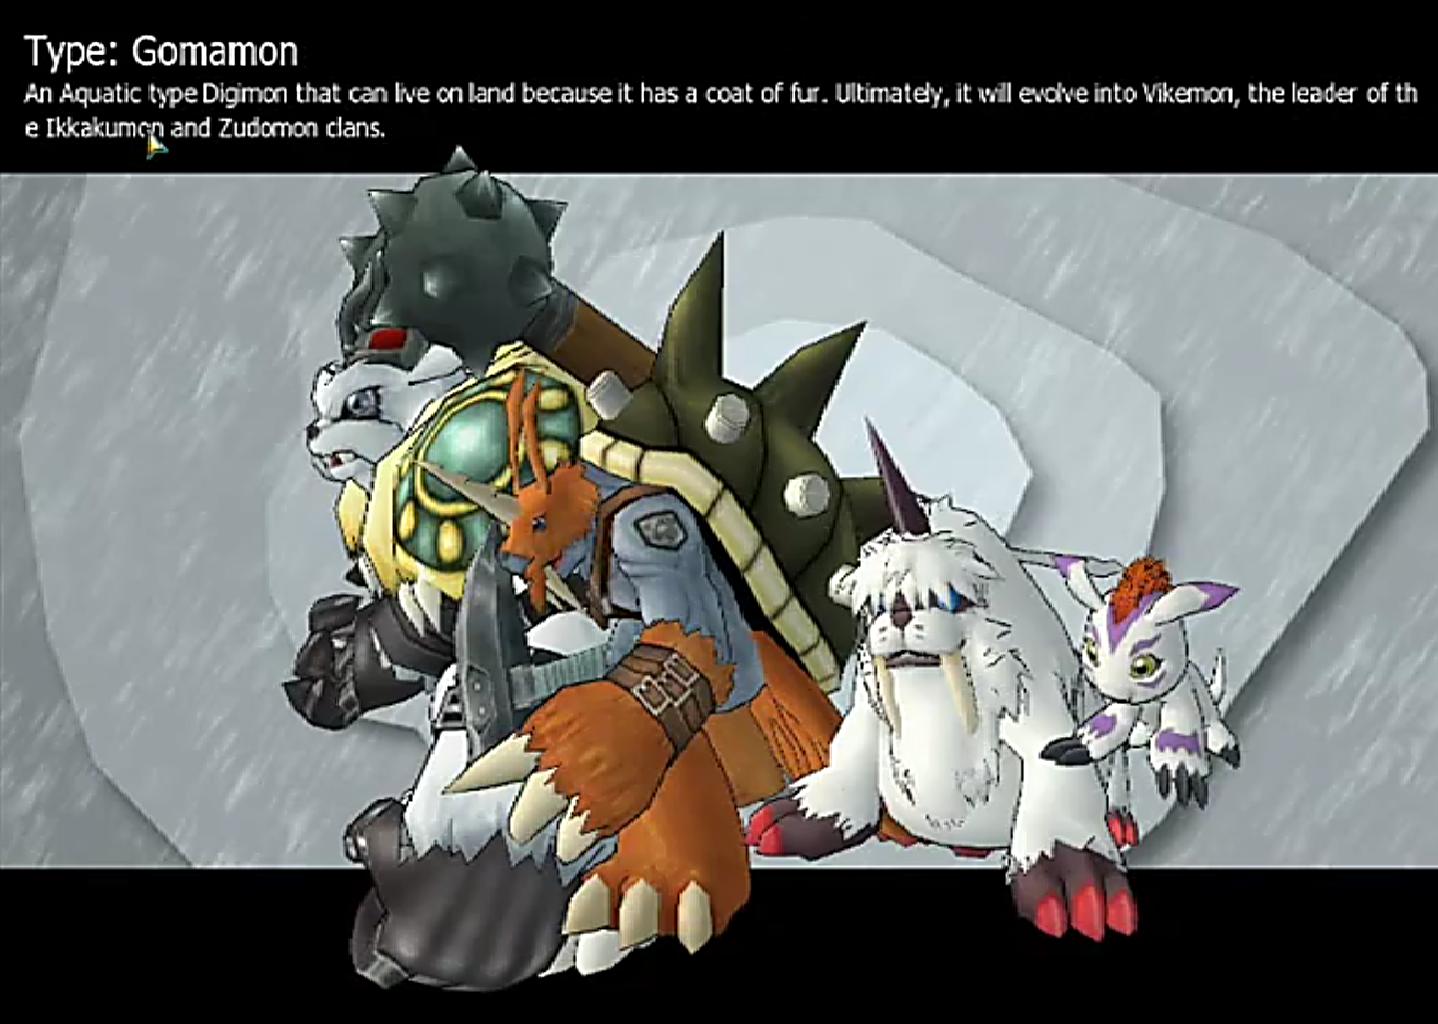 digimon gomamon evolution - photo #13